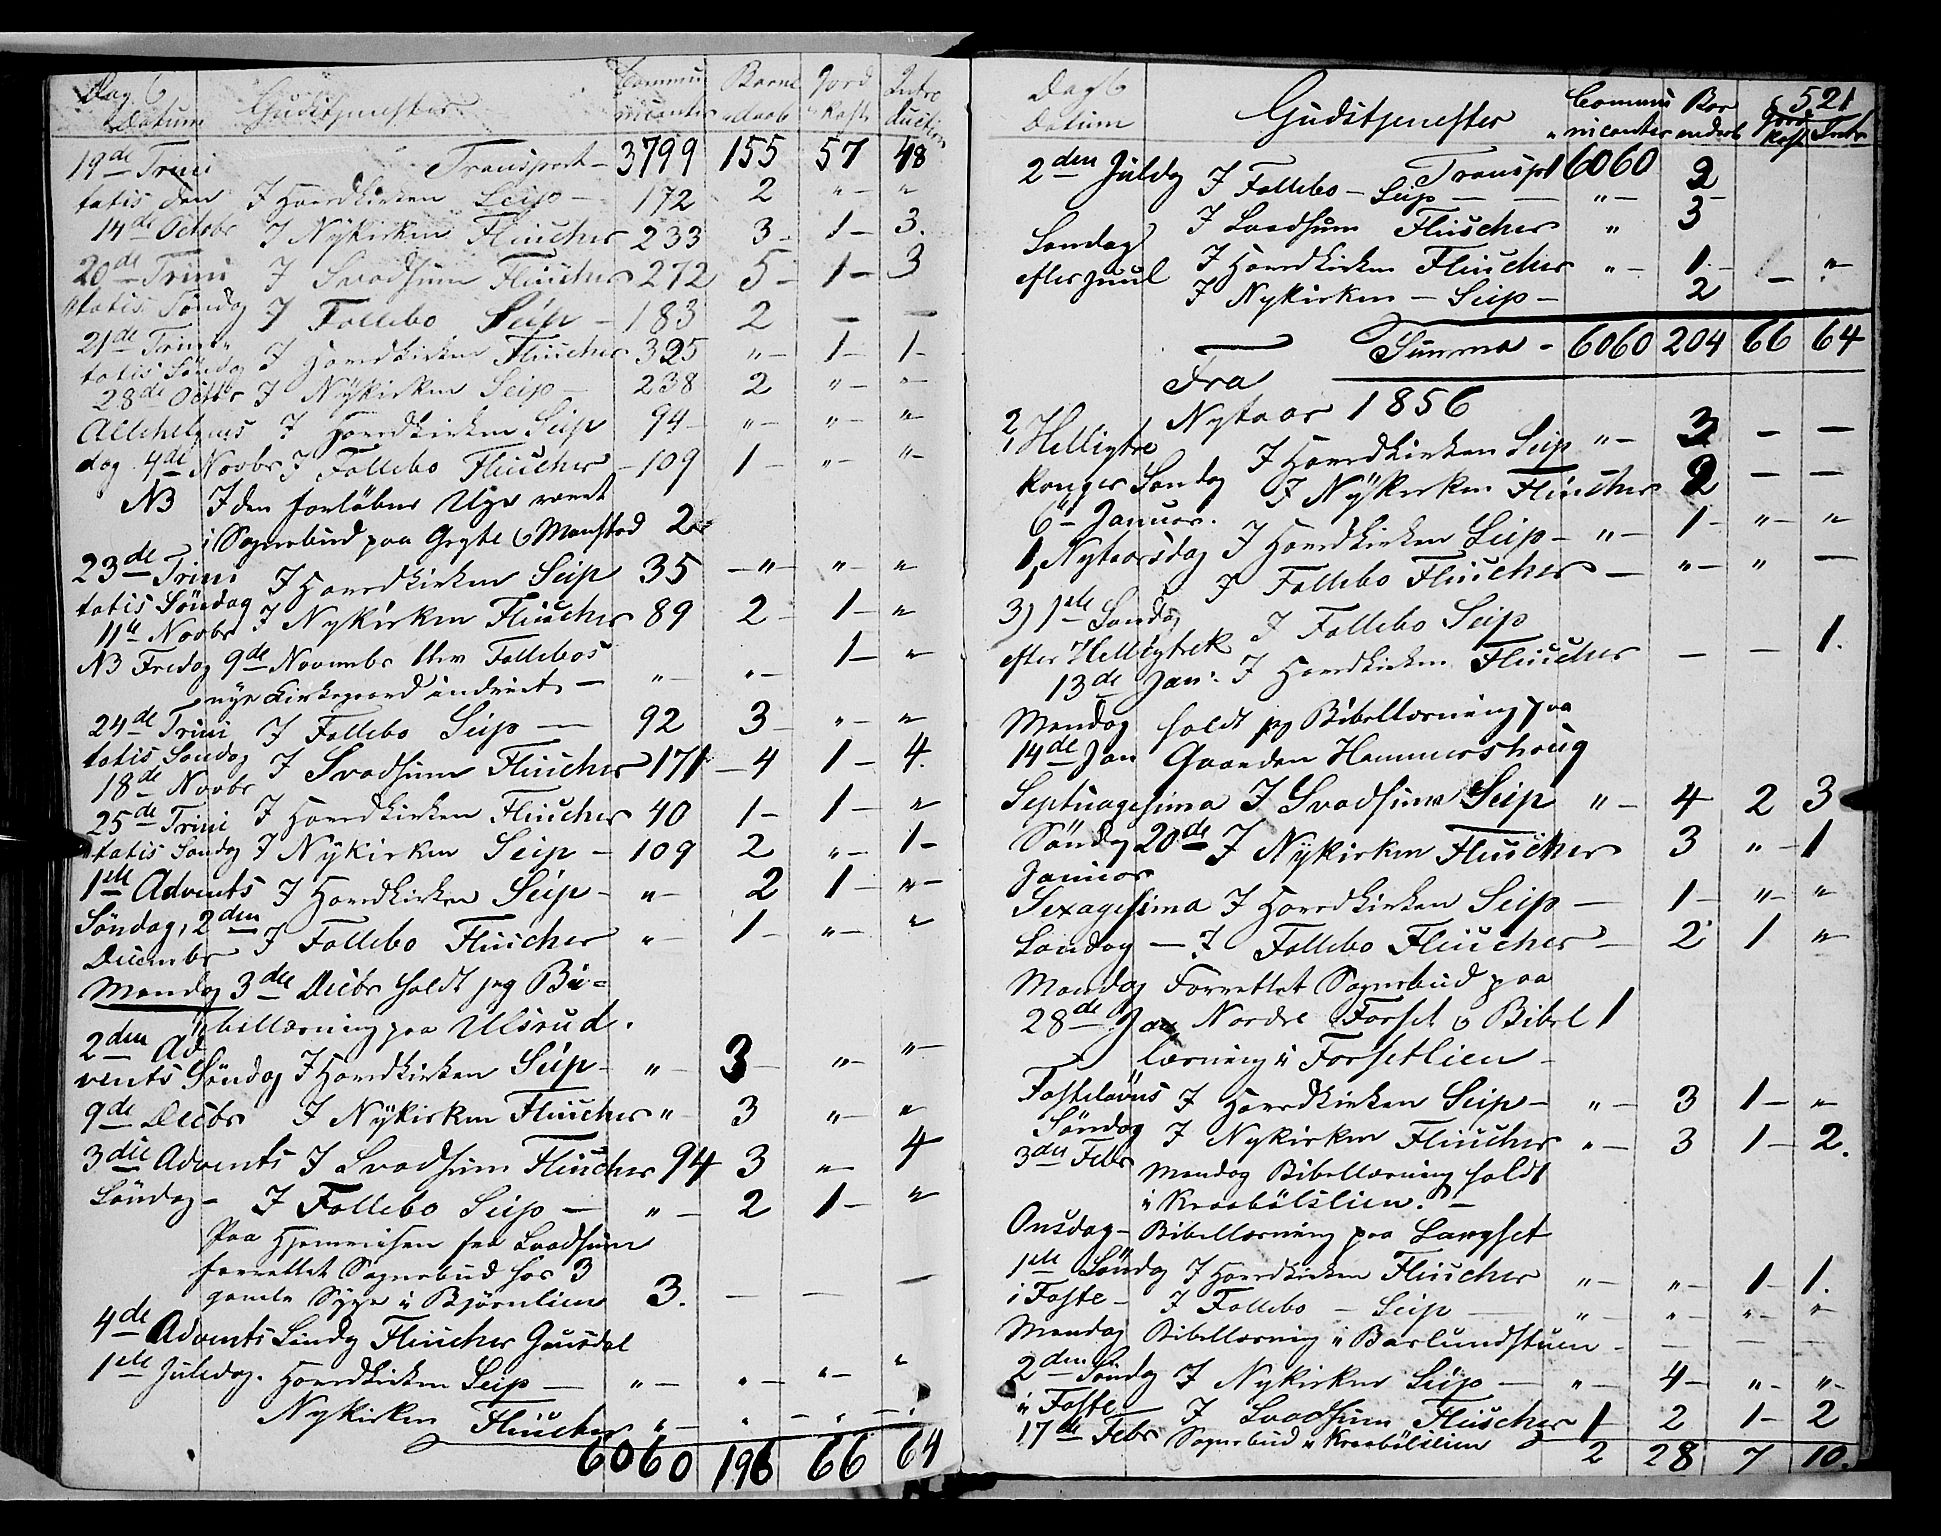 SAH, Gausdal prestekontor, Ministerialbok nr. 8, 1850-1861, s. 521